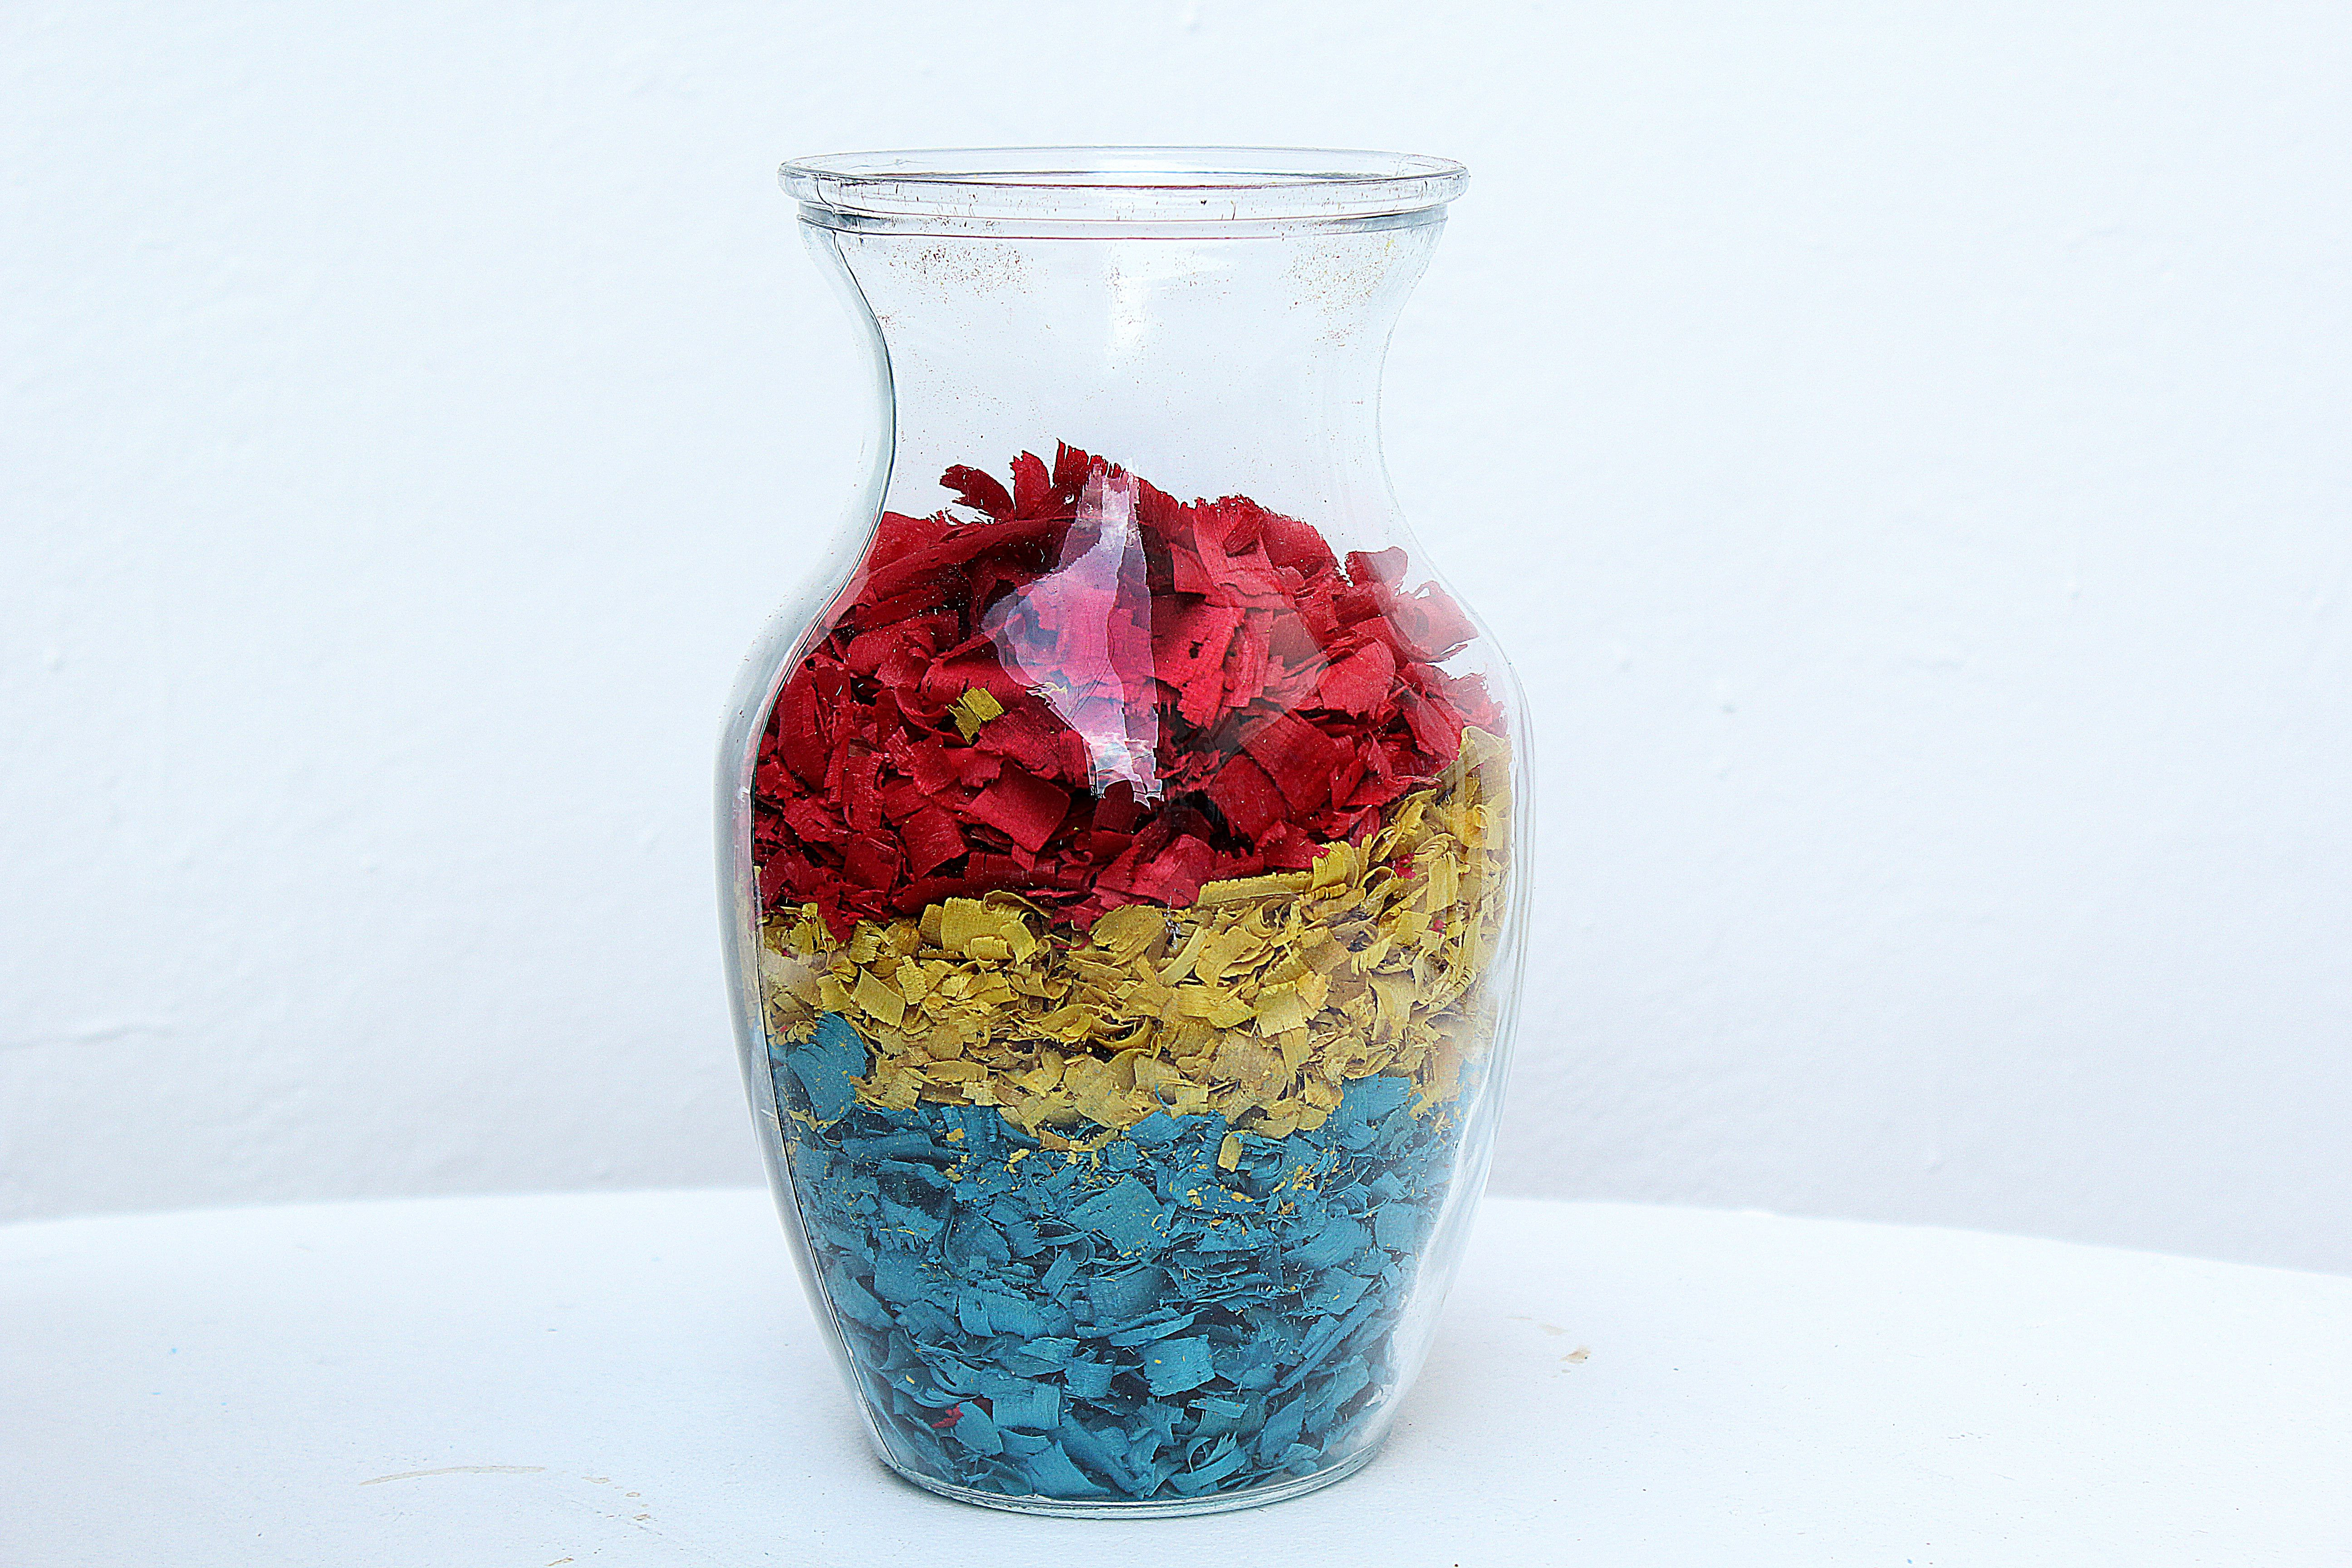 waterford crystal vase patterns of 37 fenton blue glass vase the weekly world regarding coloring colored glass vases elegant living room vase glass fresh